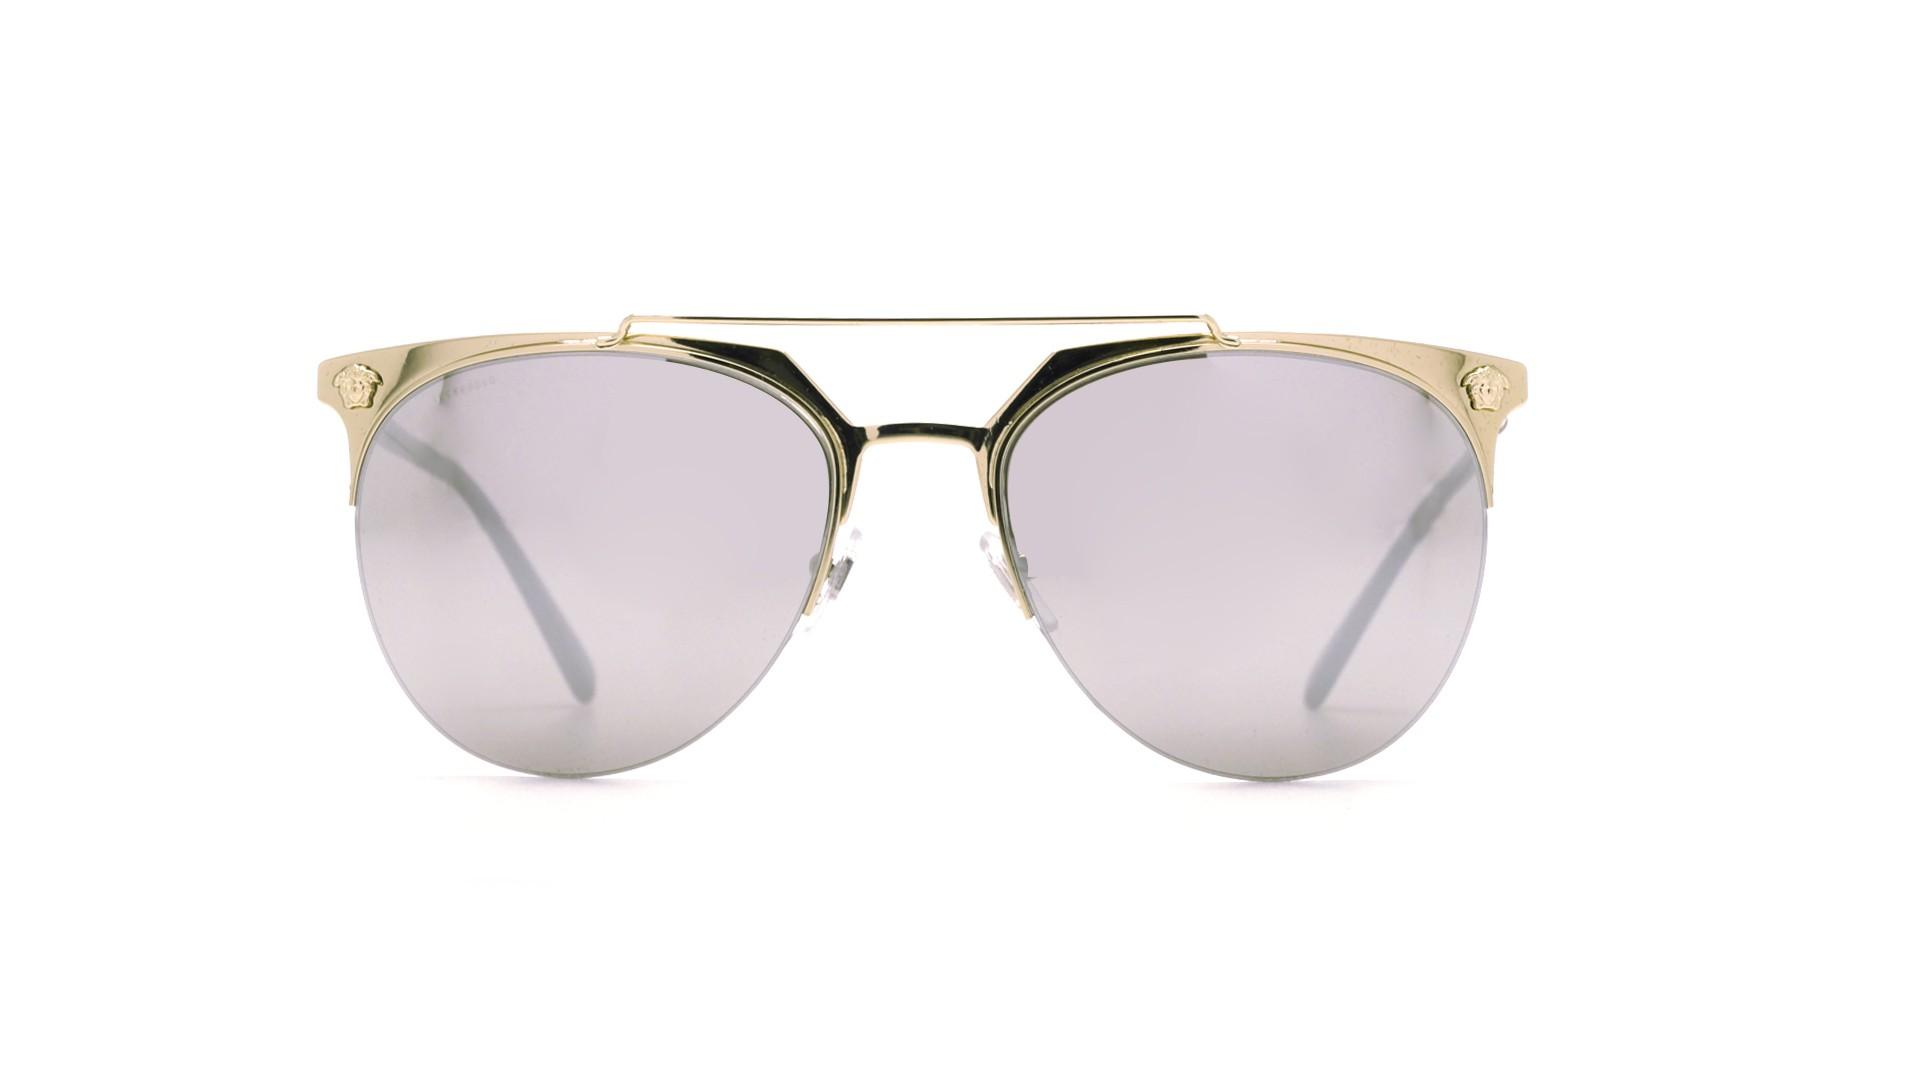 New Versace VE 2181 1252//6G Gold w//Light Grey Mirror Silver Sunglasses